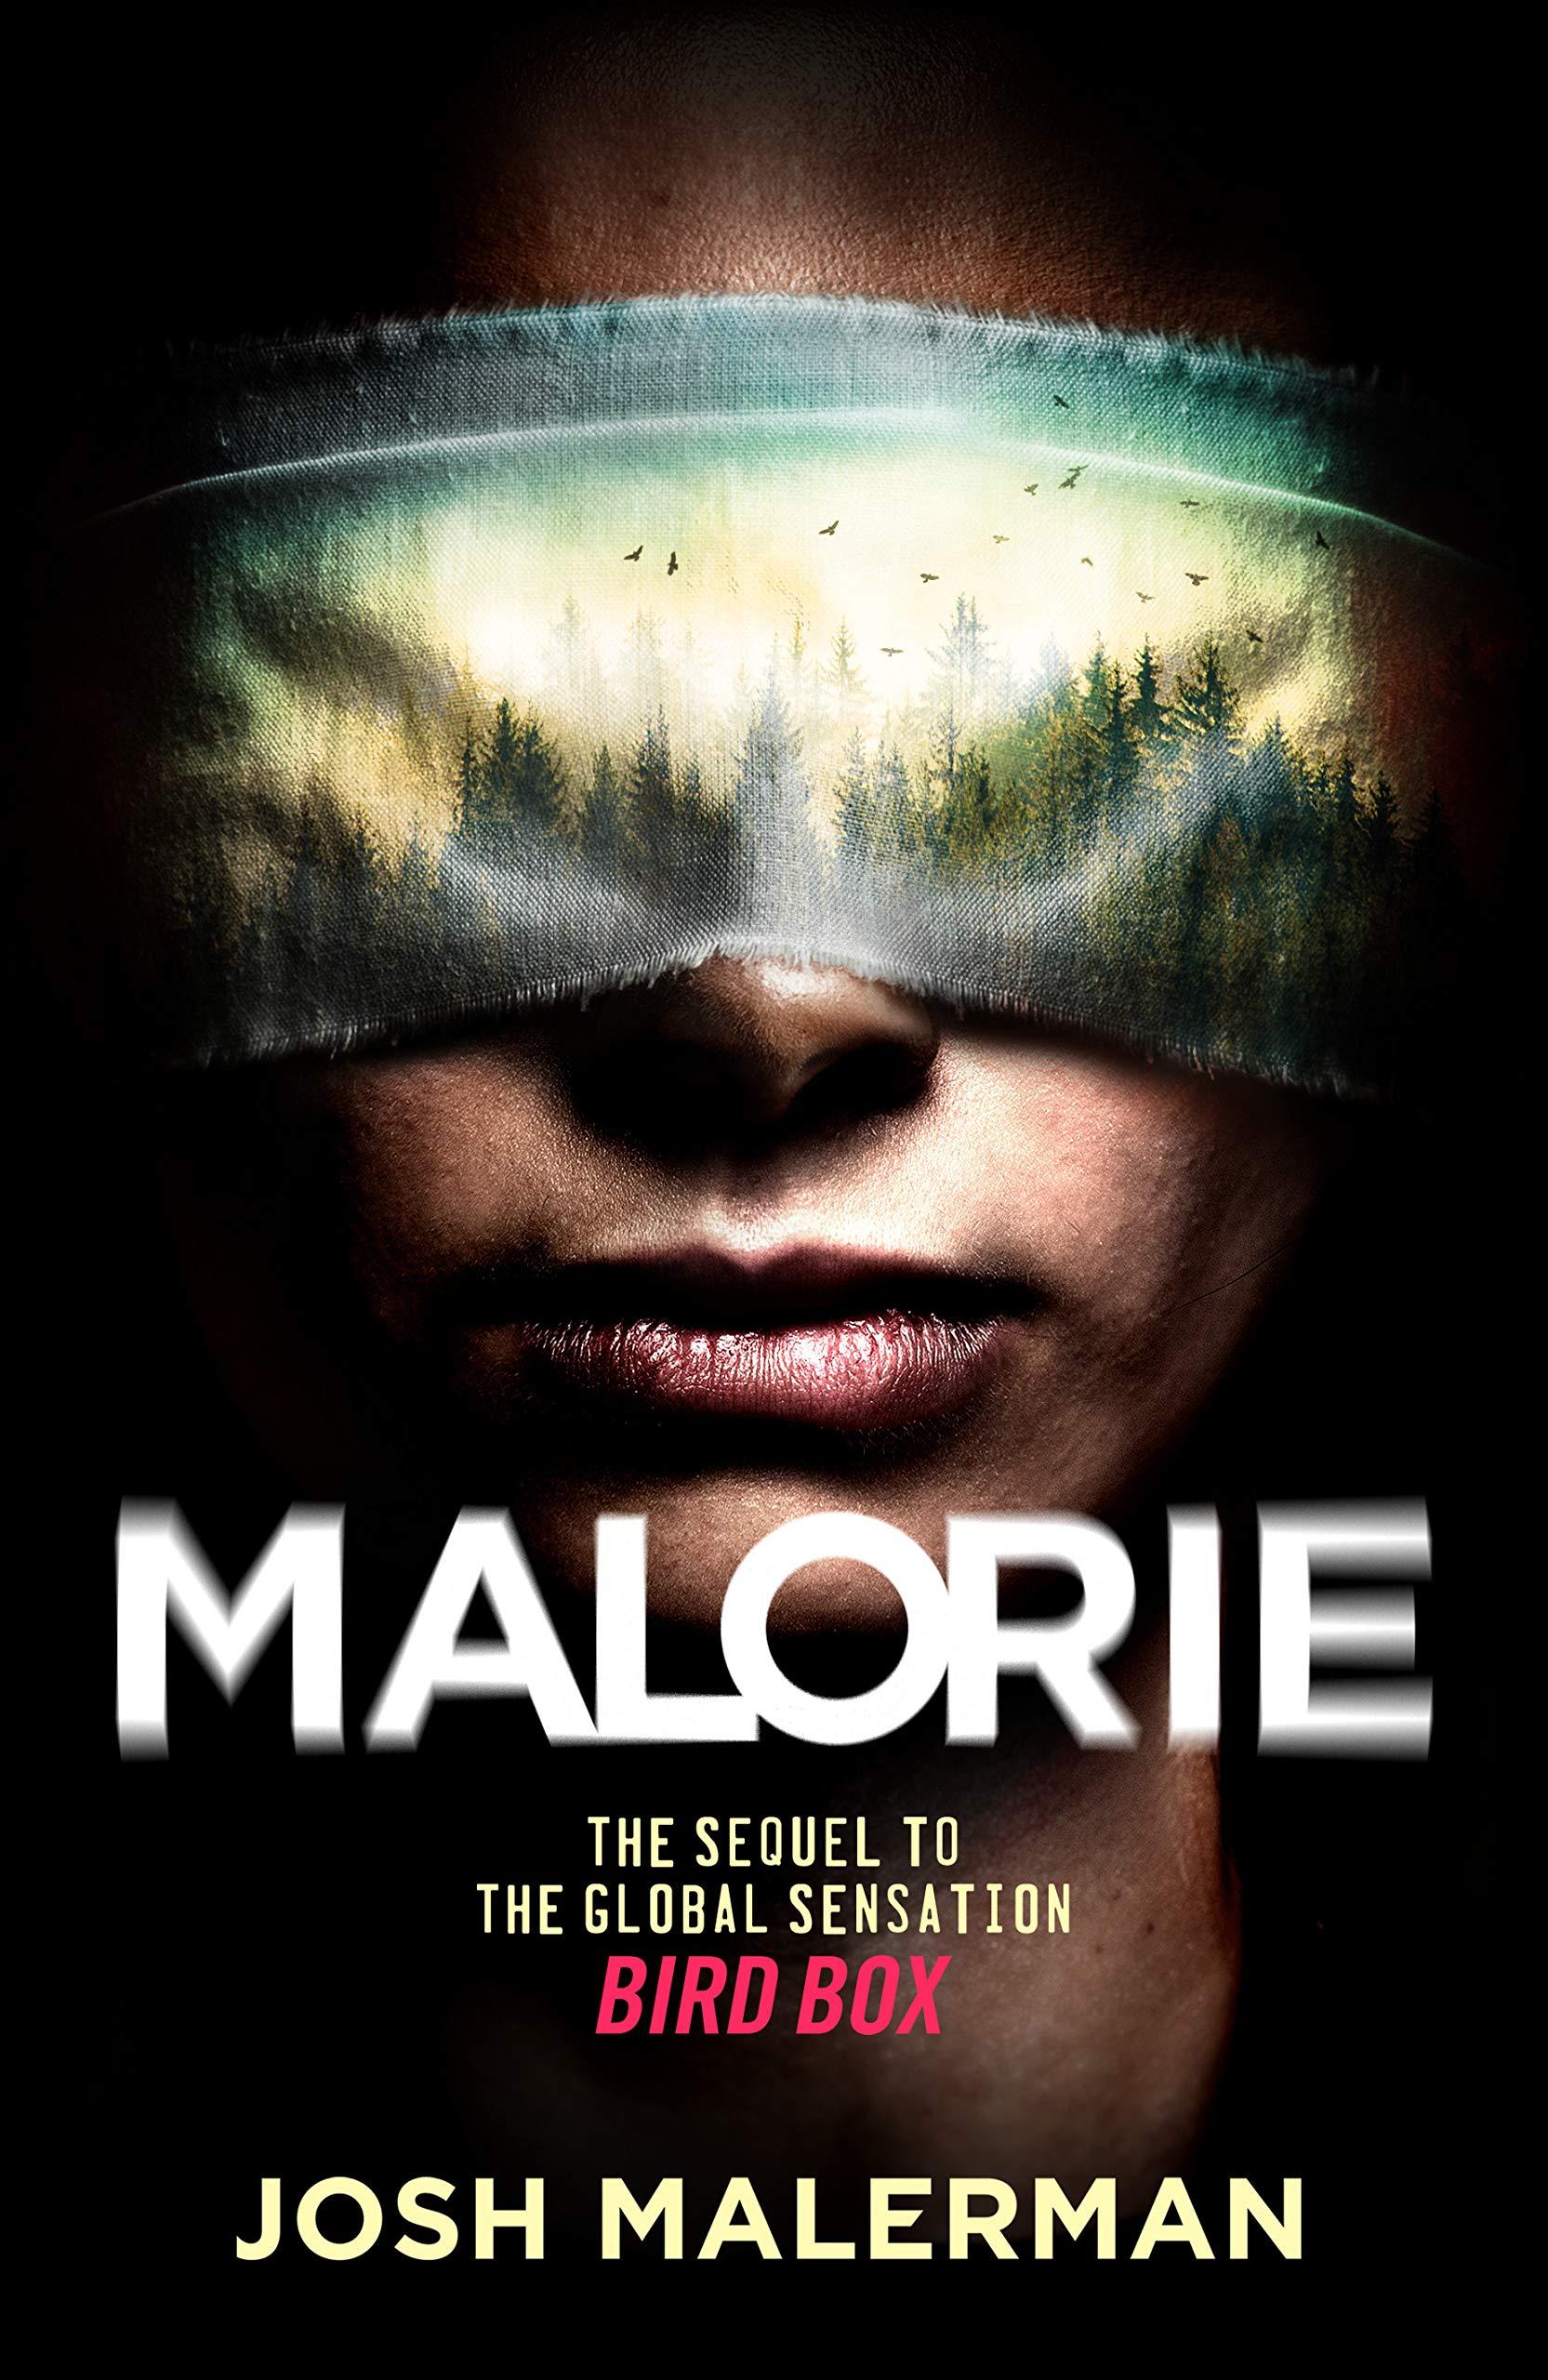 Malorie-bird-box-2